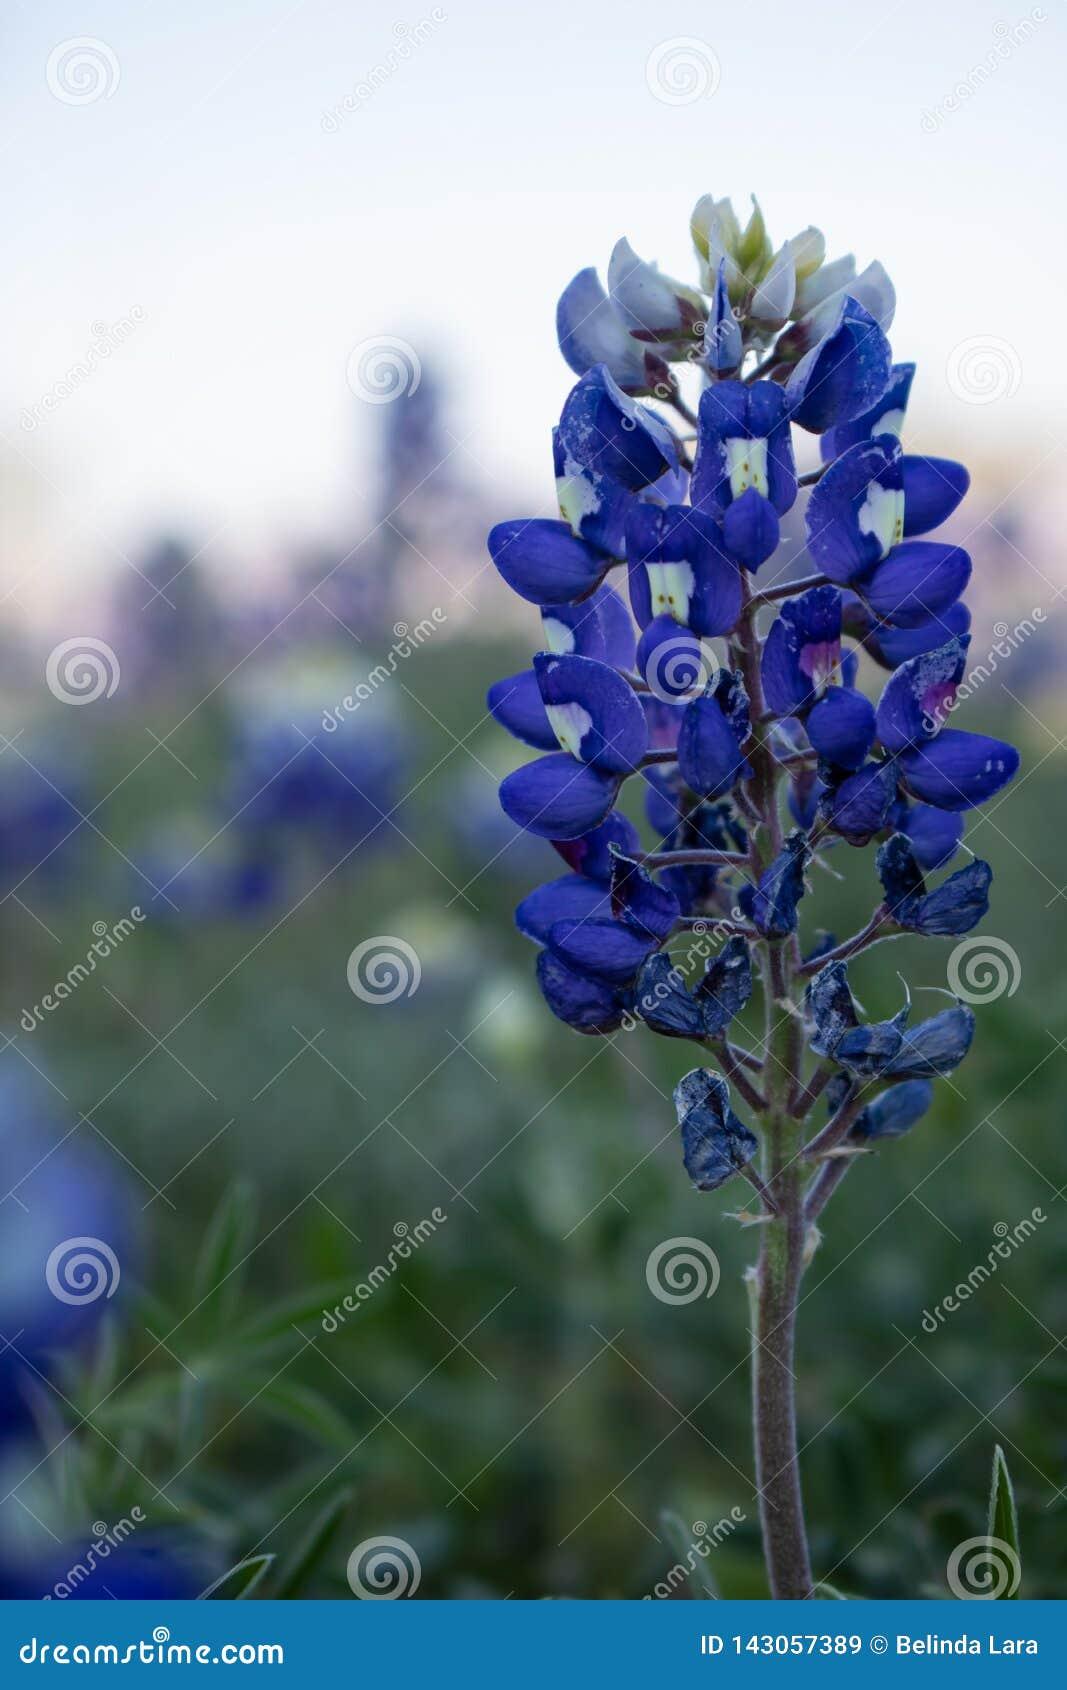 Single Texas Bluebonnet Bloom with bokeh background